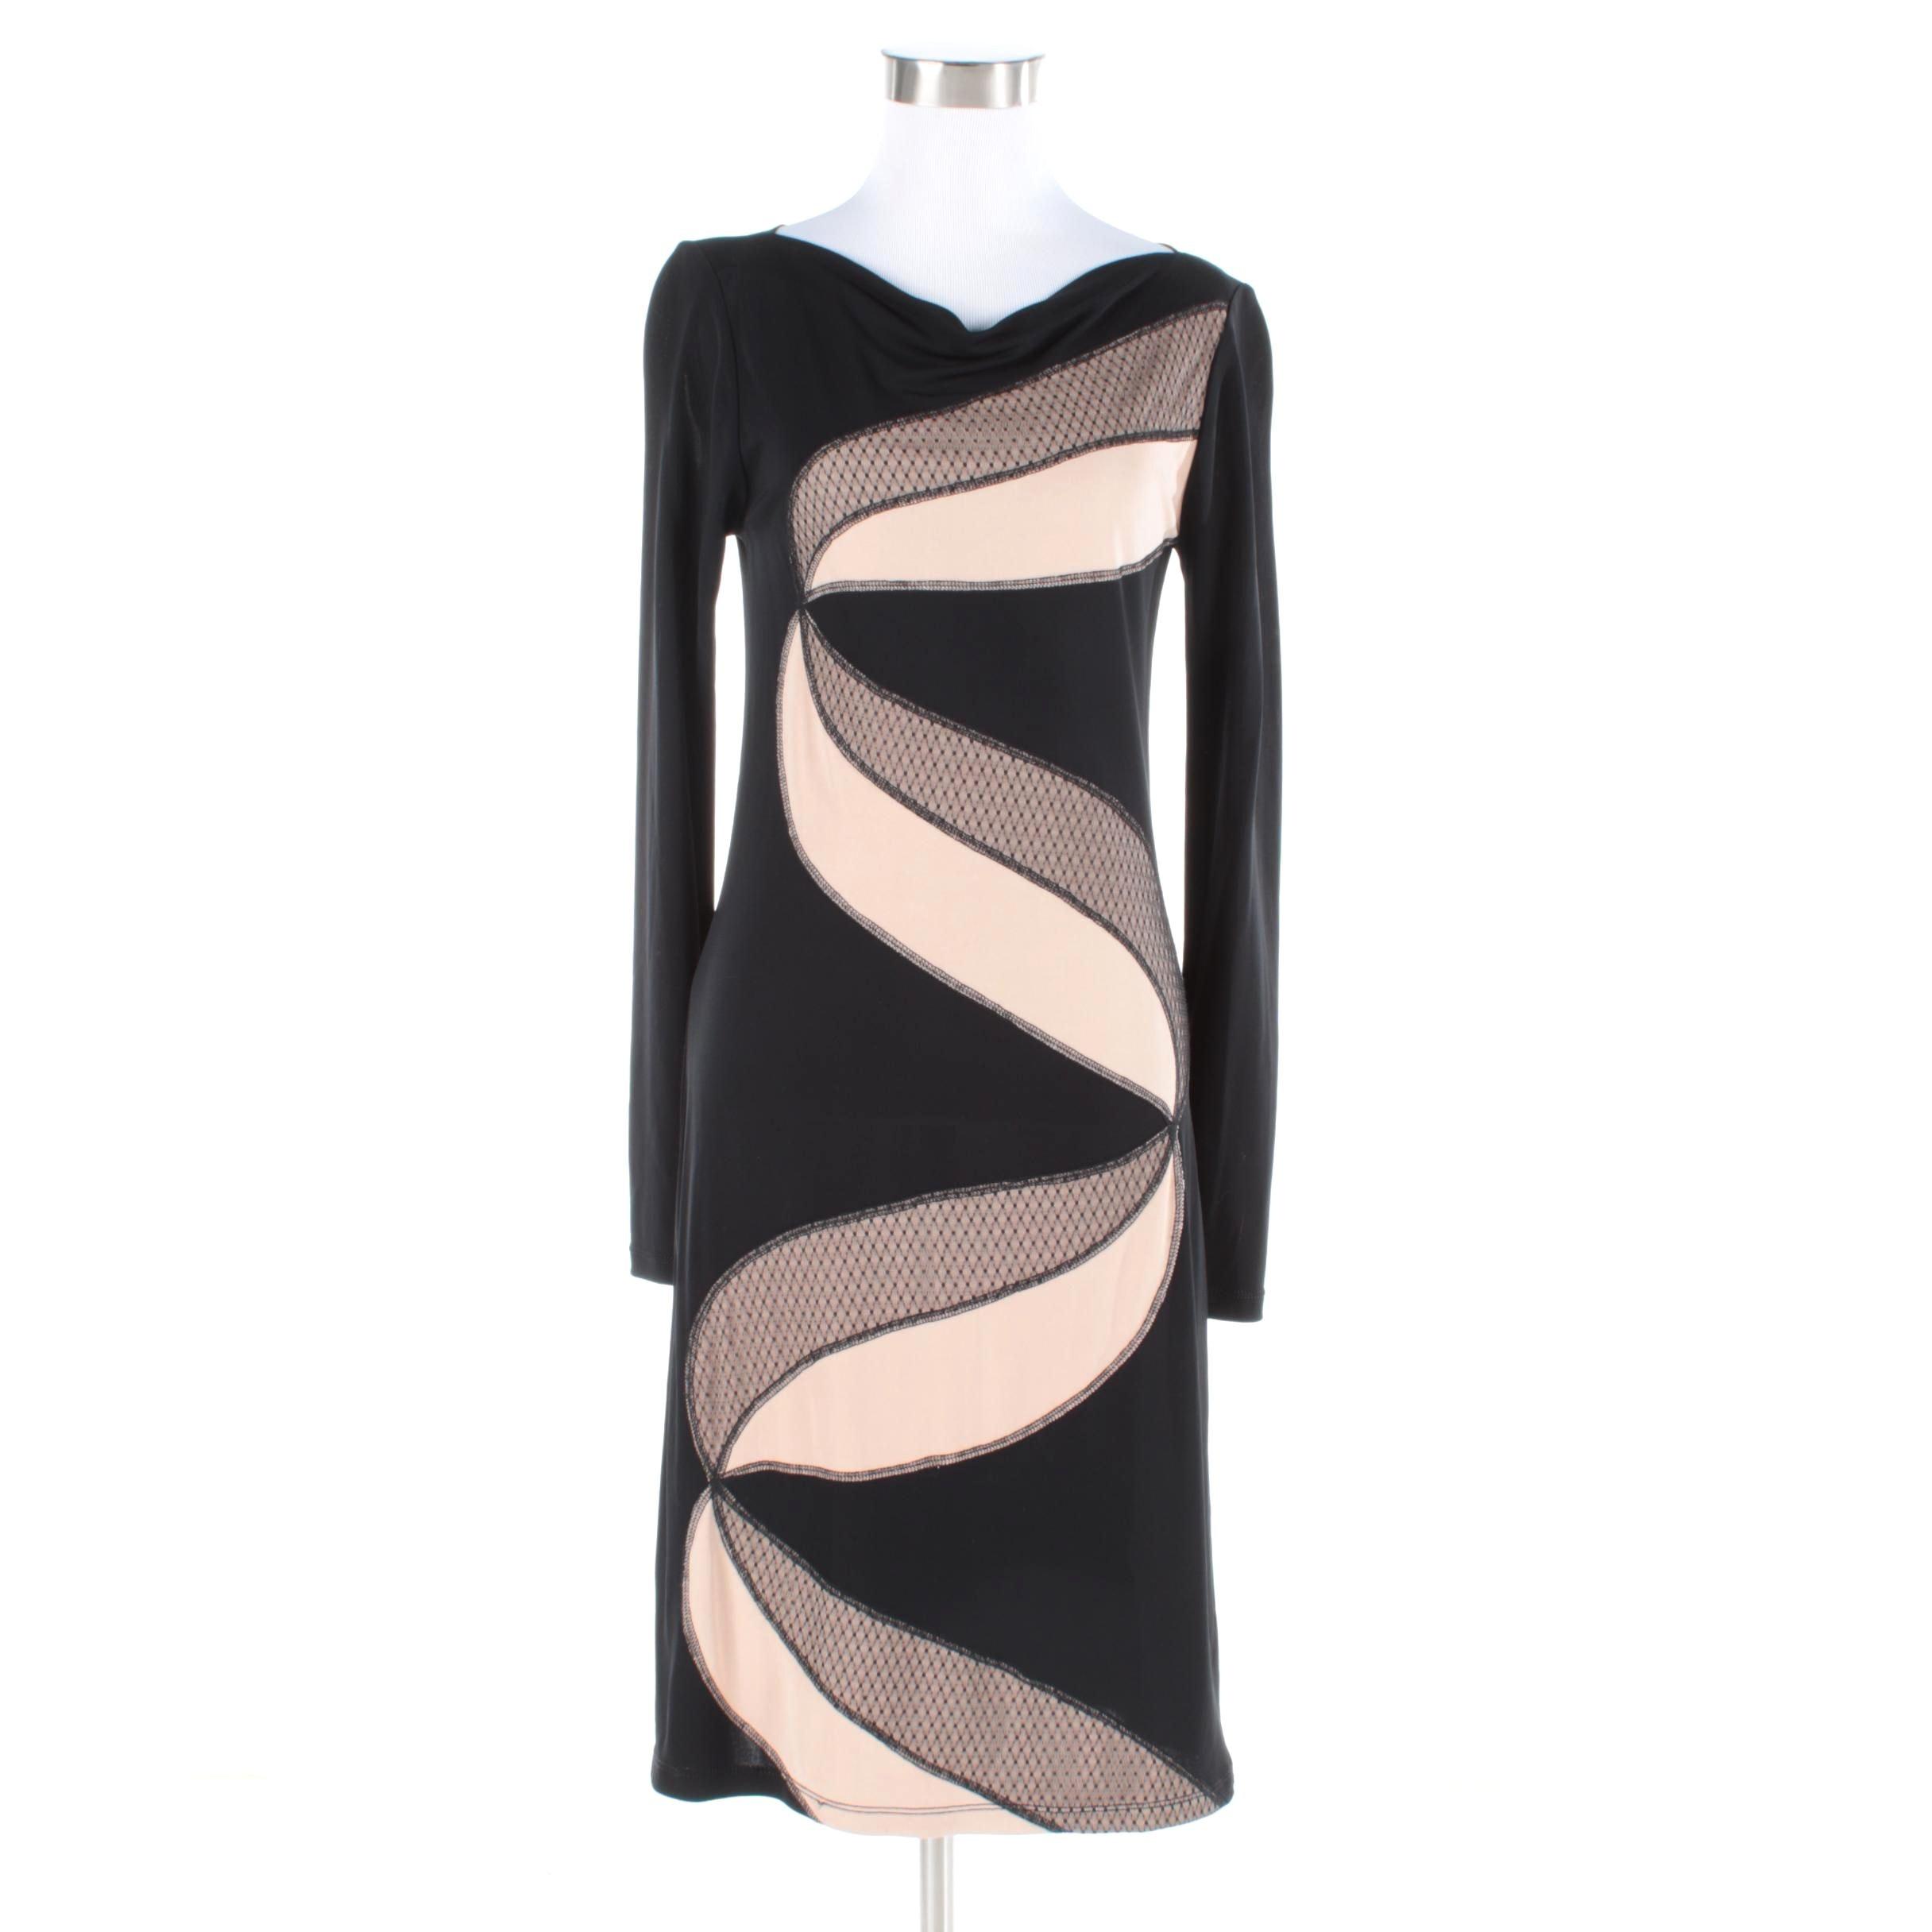 Catherine Malandrino Black Cowl Neck Dress with Blush Accent NWT